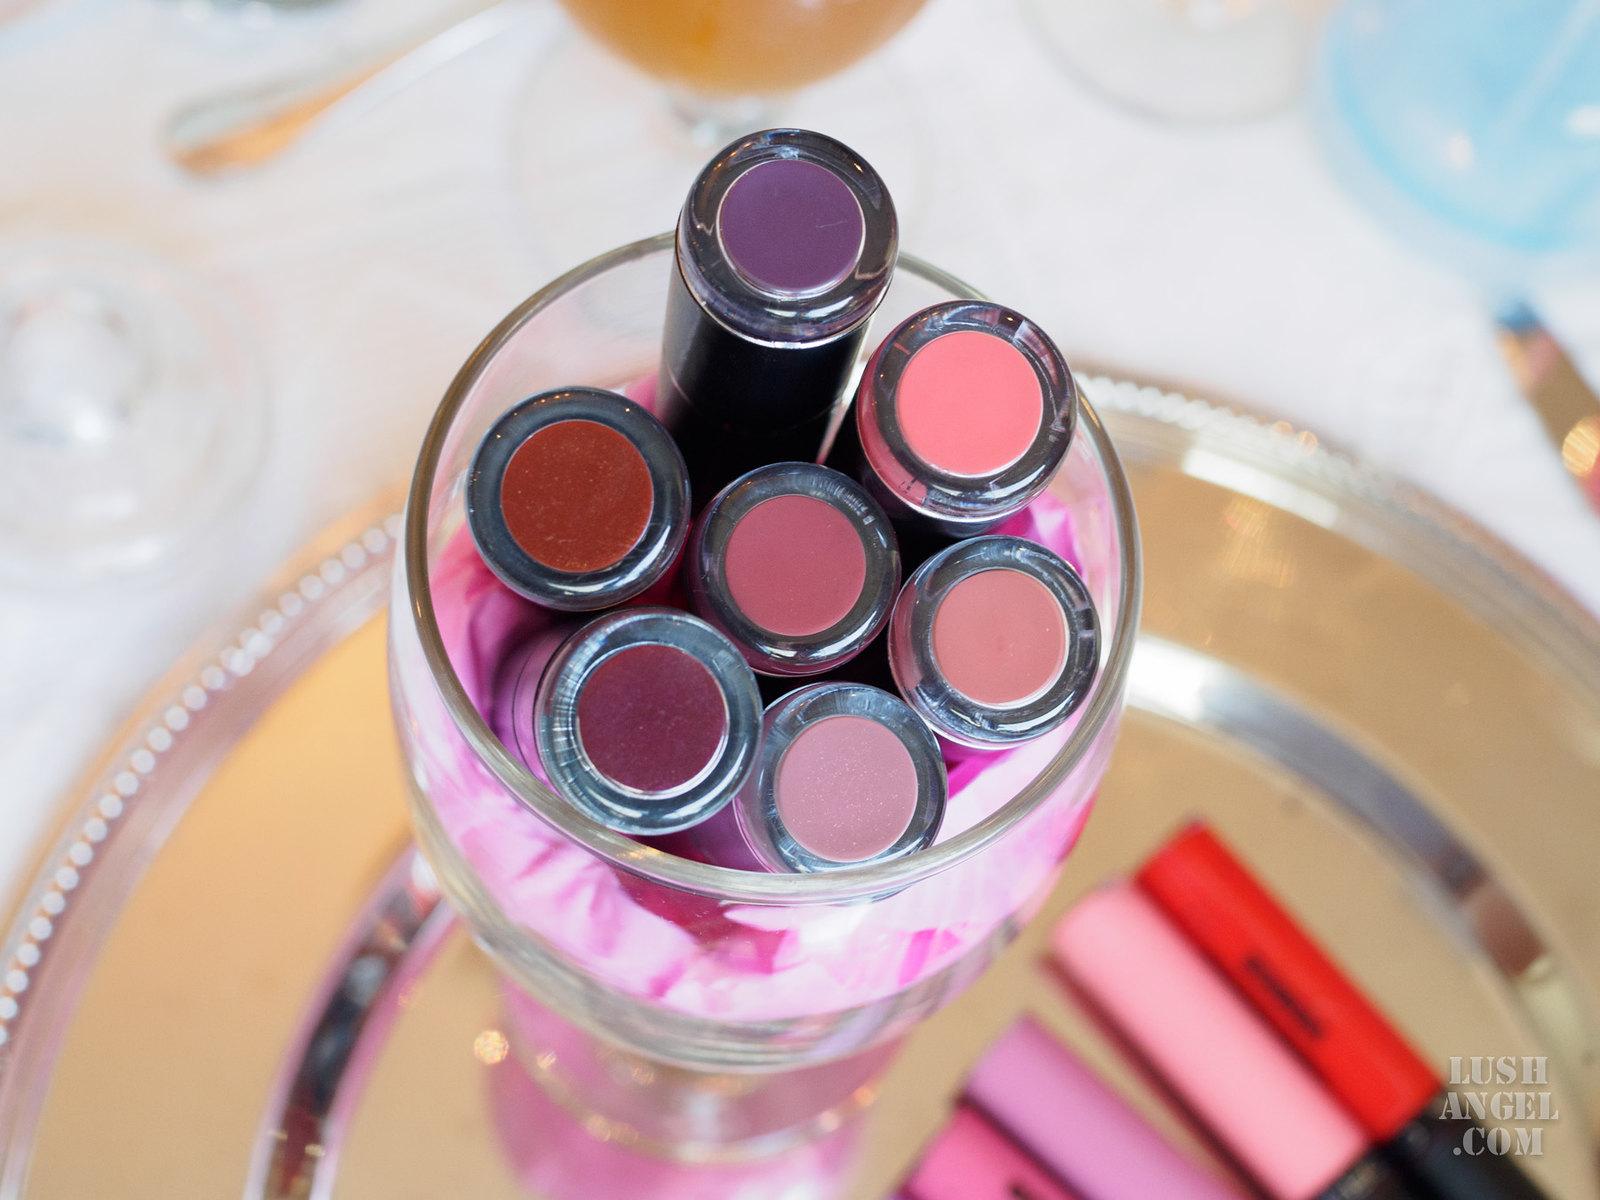 ofra-lipsticks-philippines